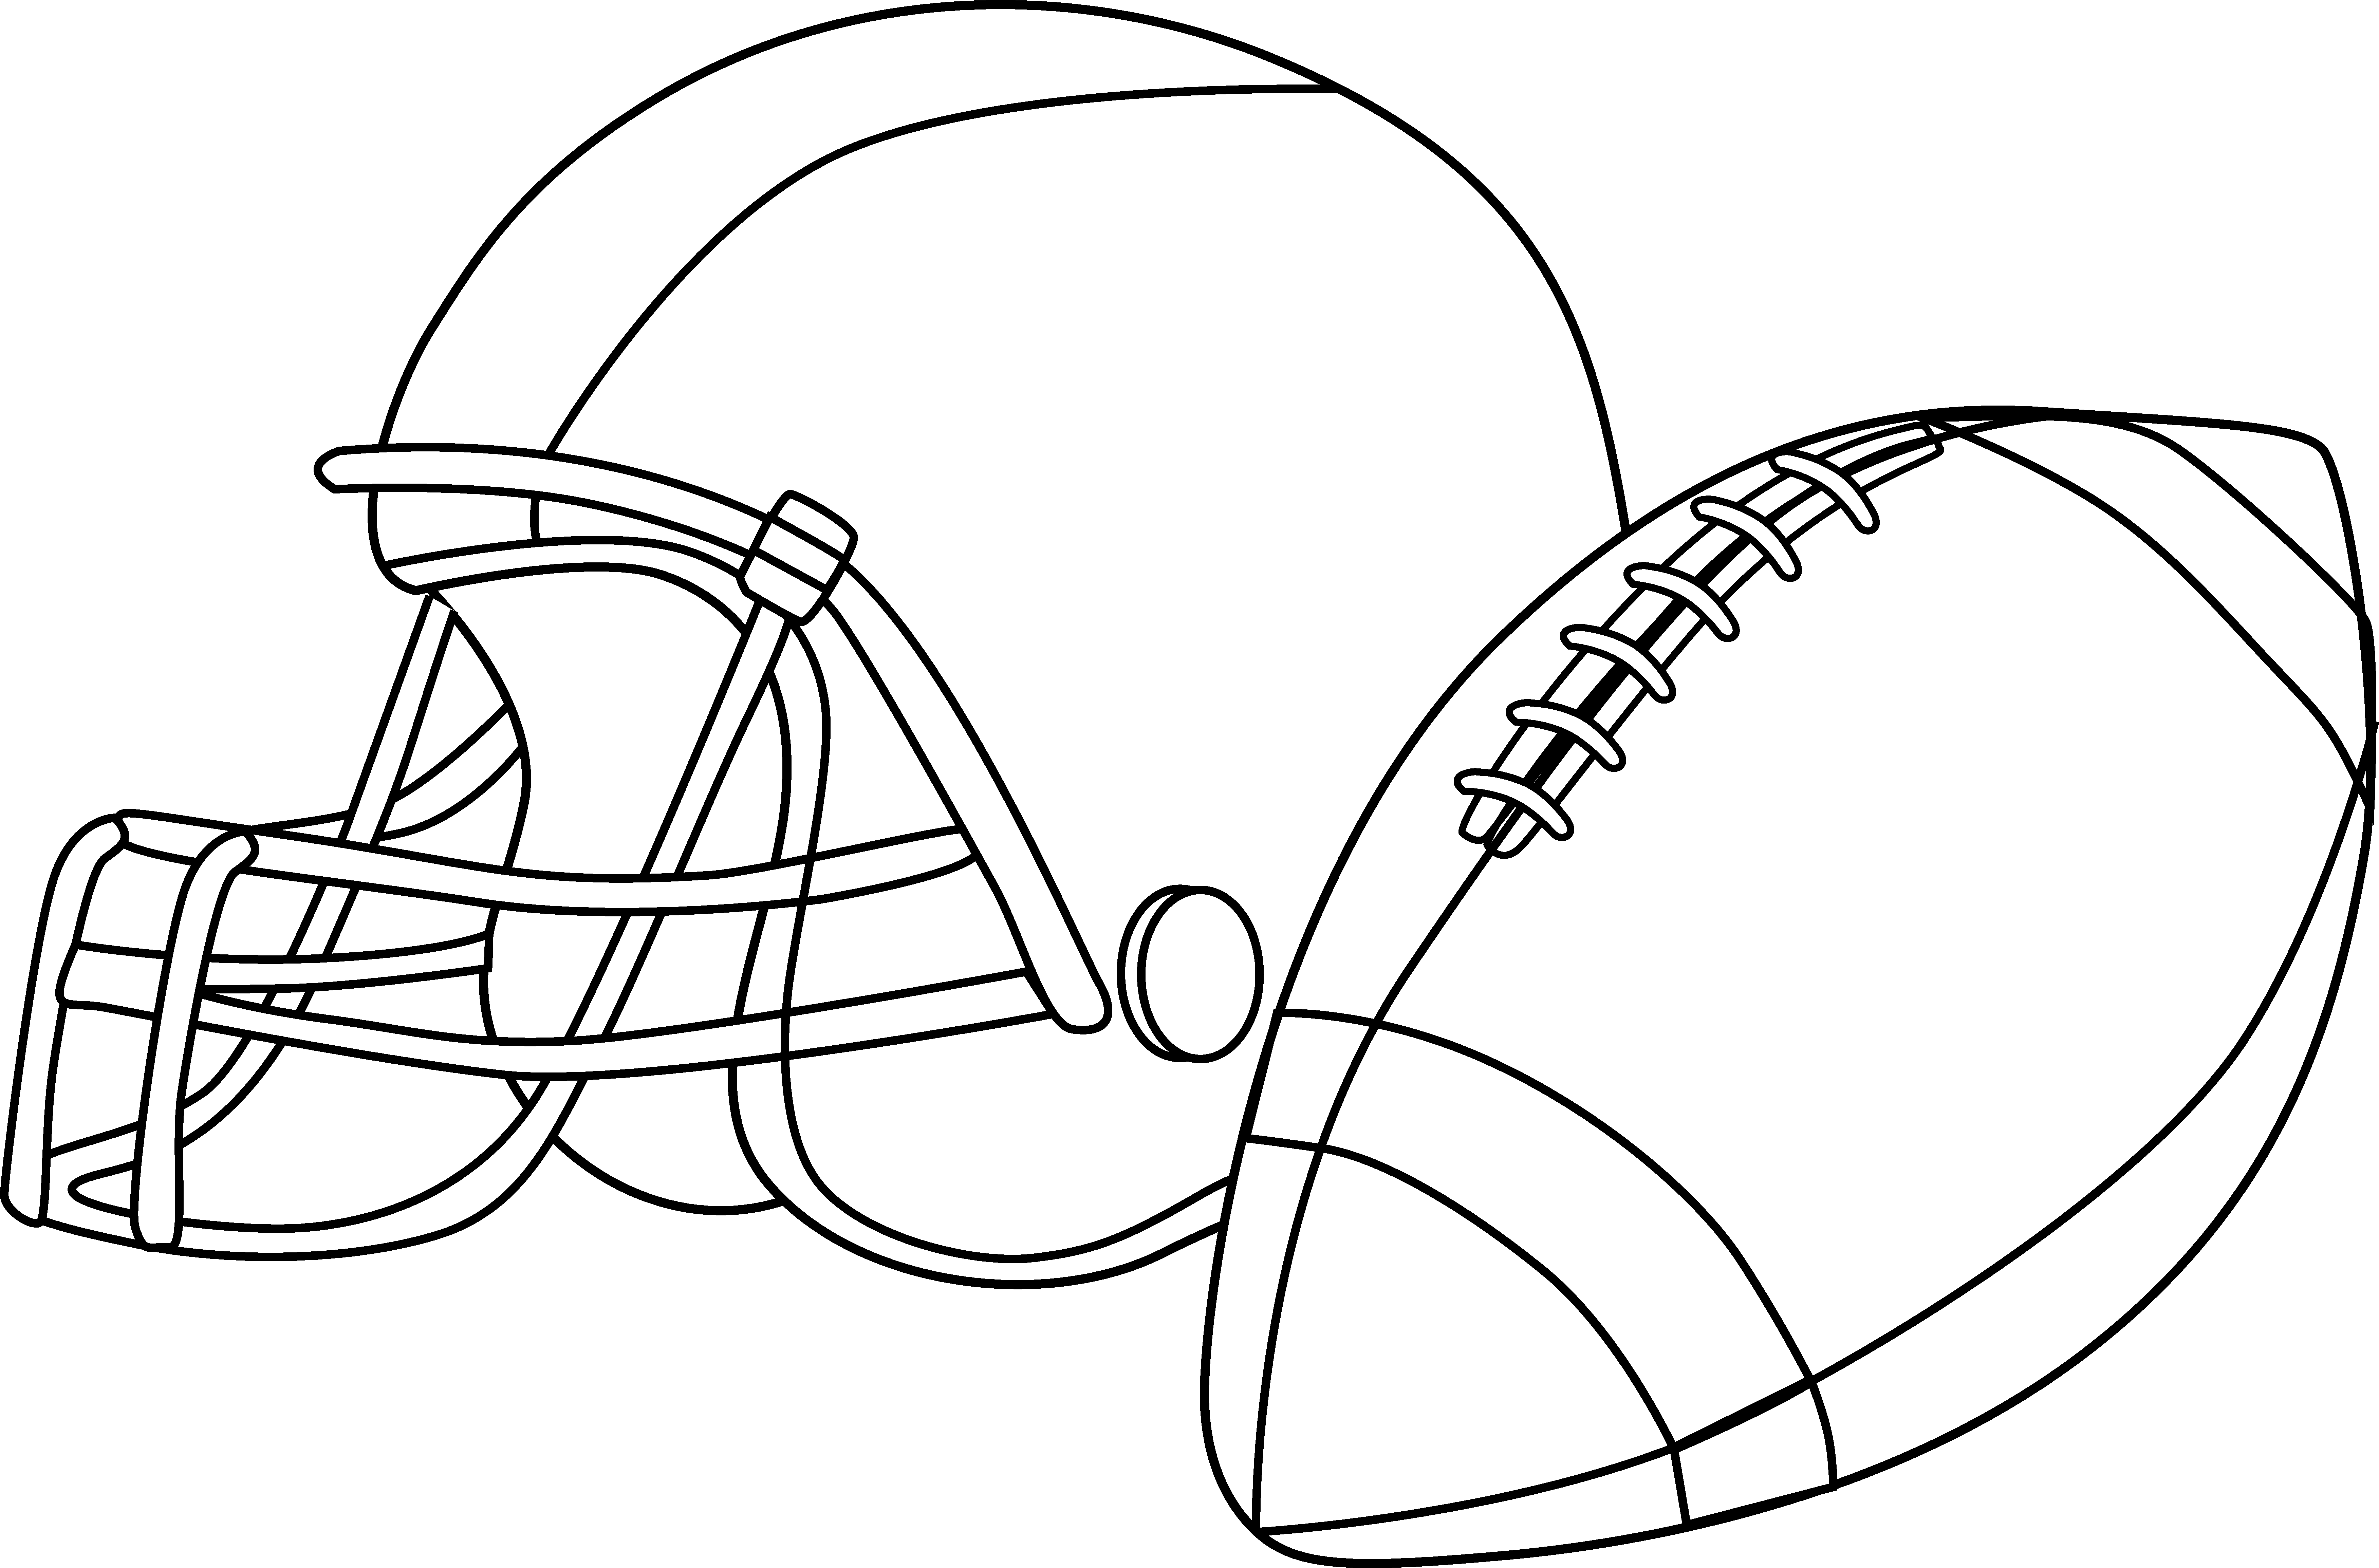 American football cartoon black and white